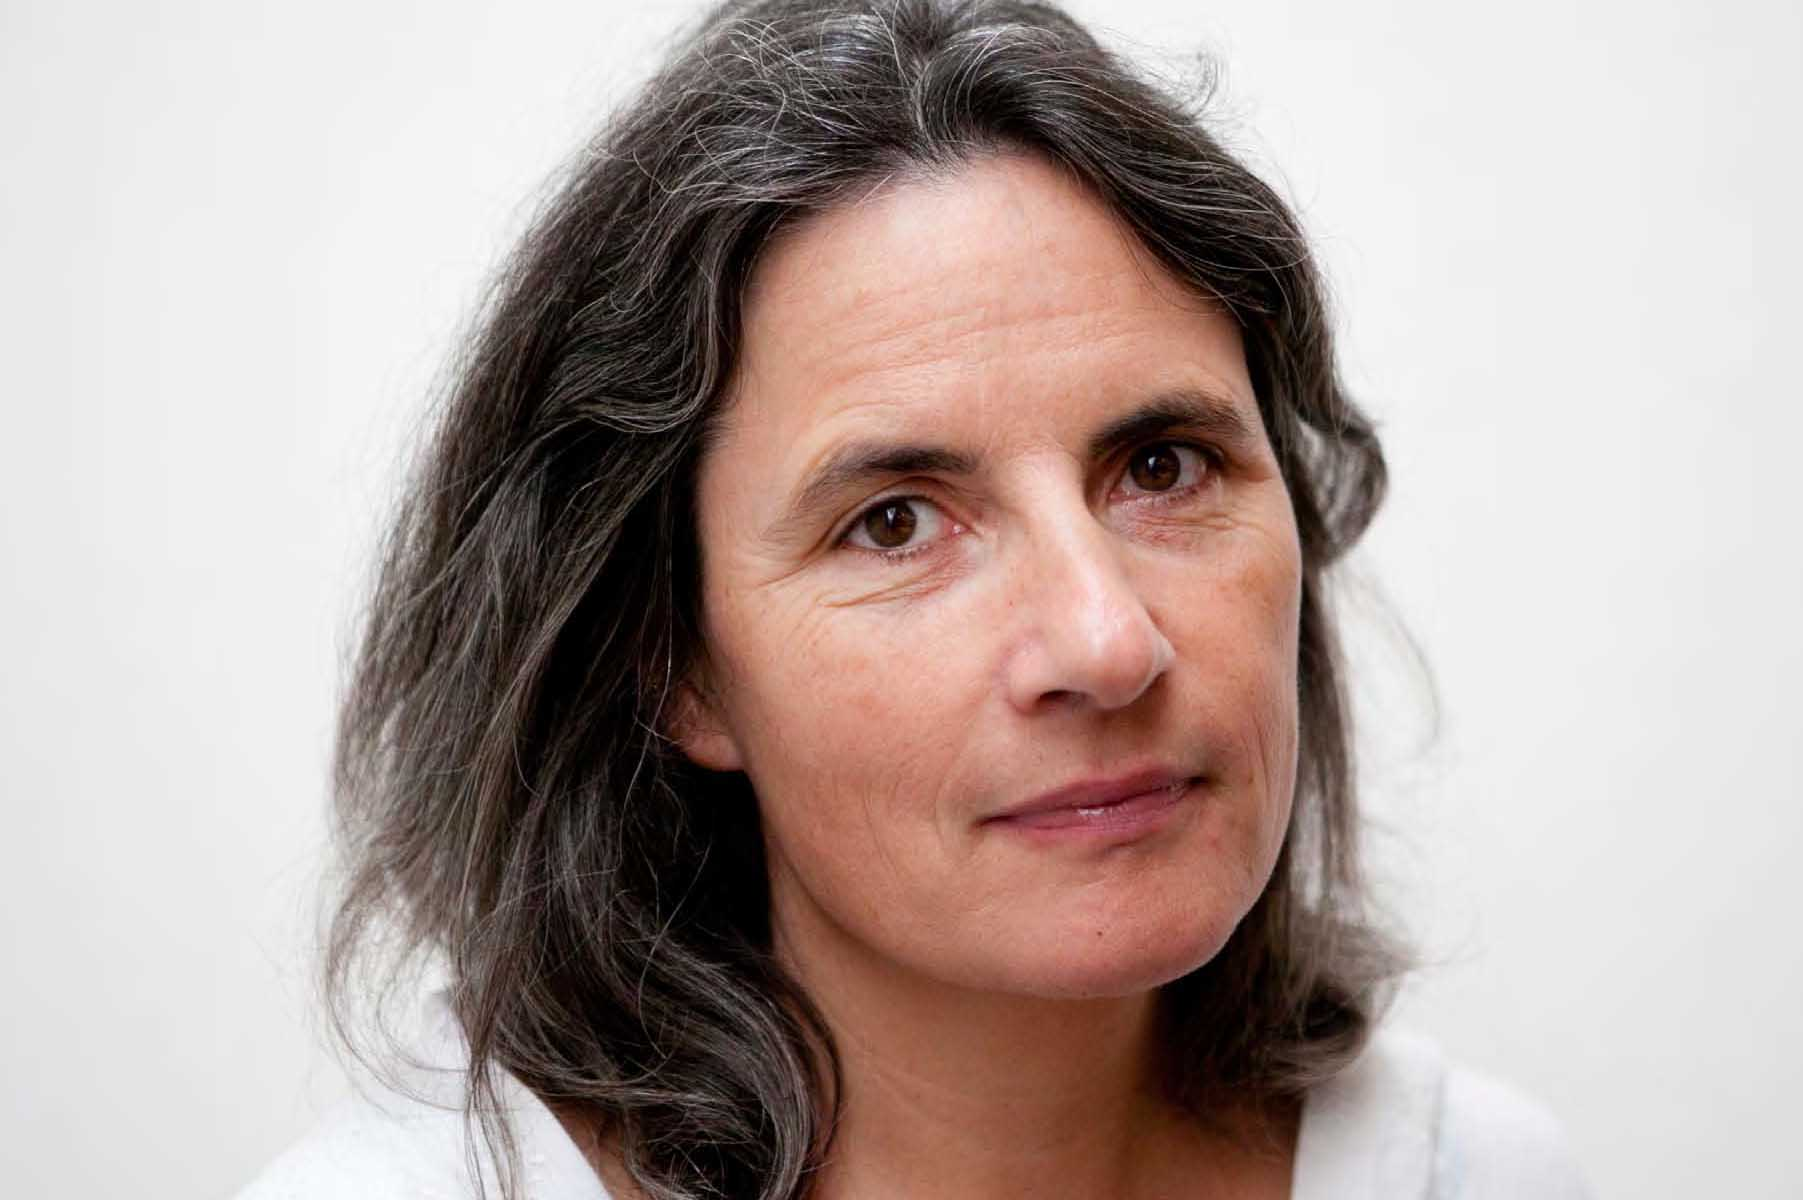 Professor Dr. Dominique Soldati-Favre